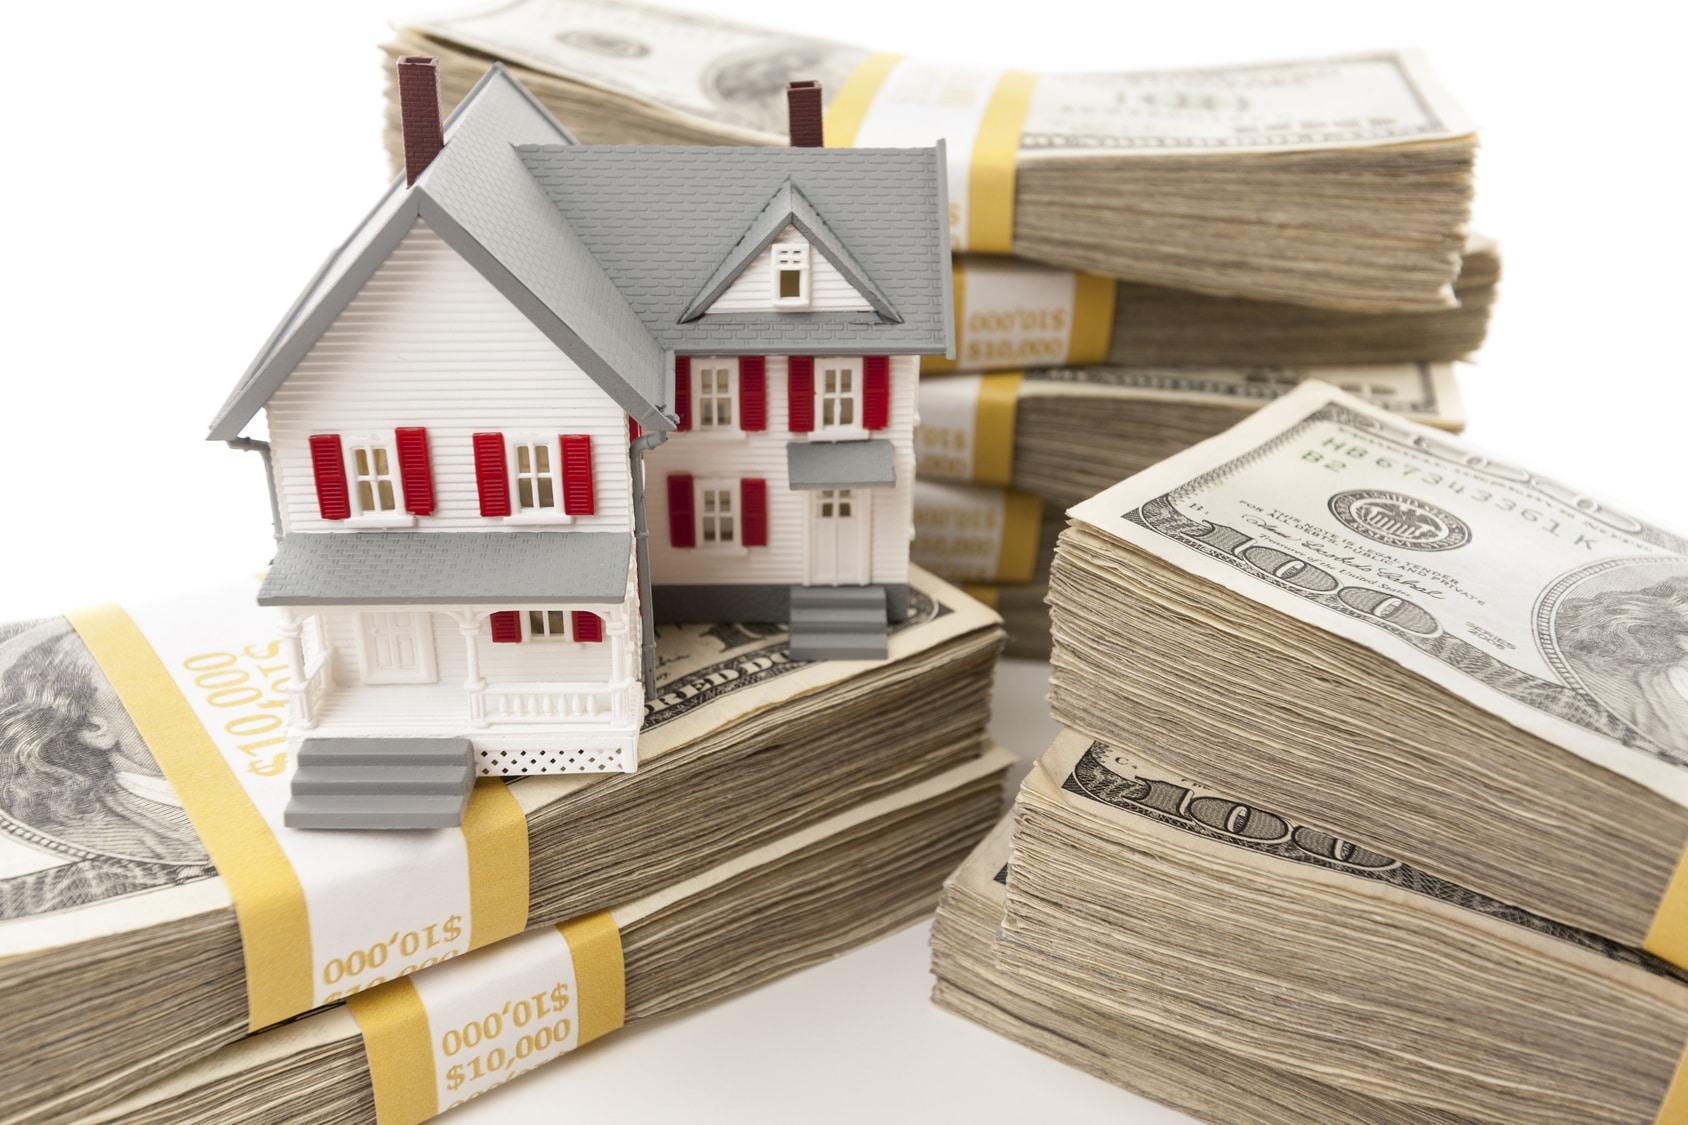 Stacks of one hundred dollar bills with small house for Acheter une maison en floride